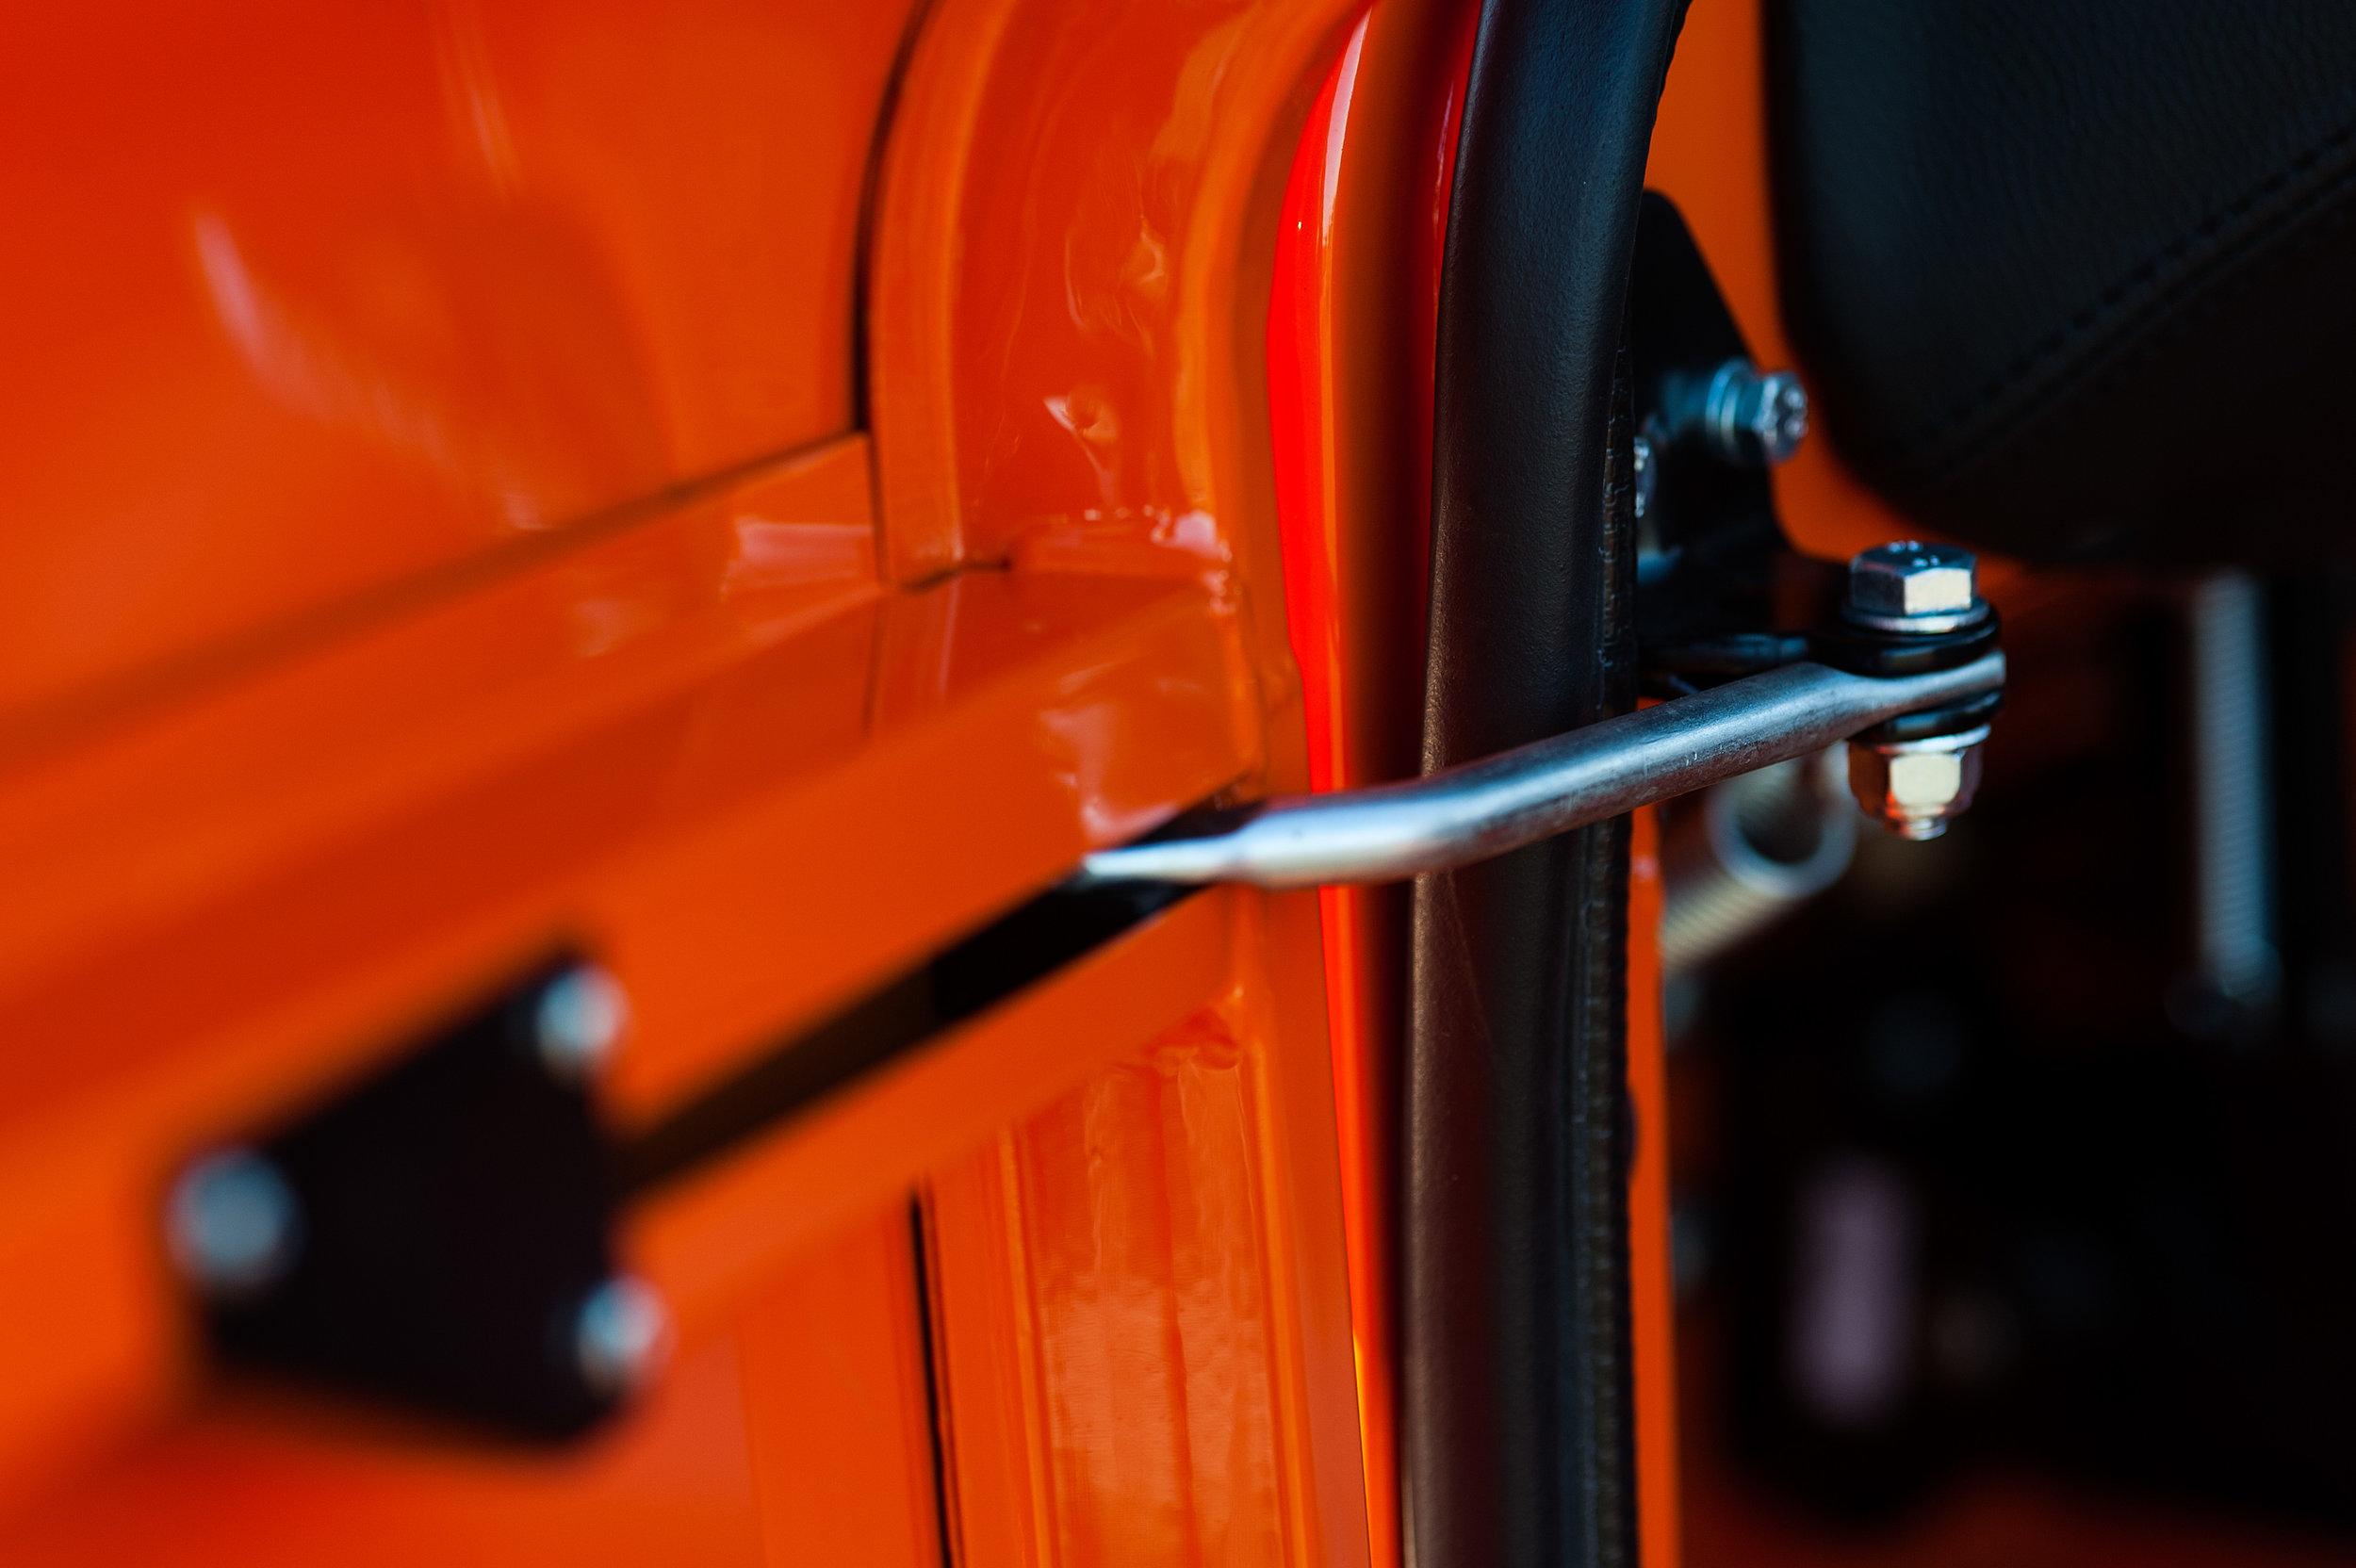 ZPA_6018-Edit © info@zepedroalvarez.com.jpg